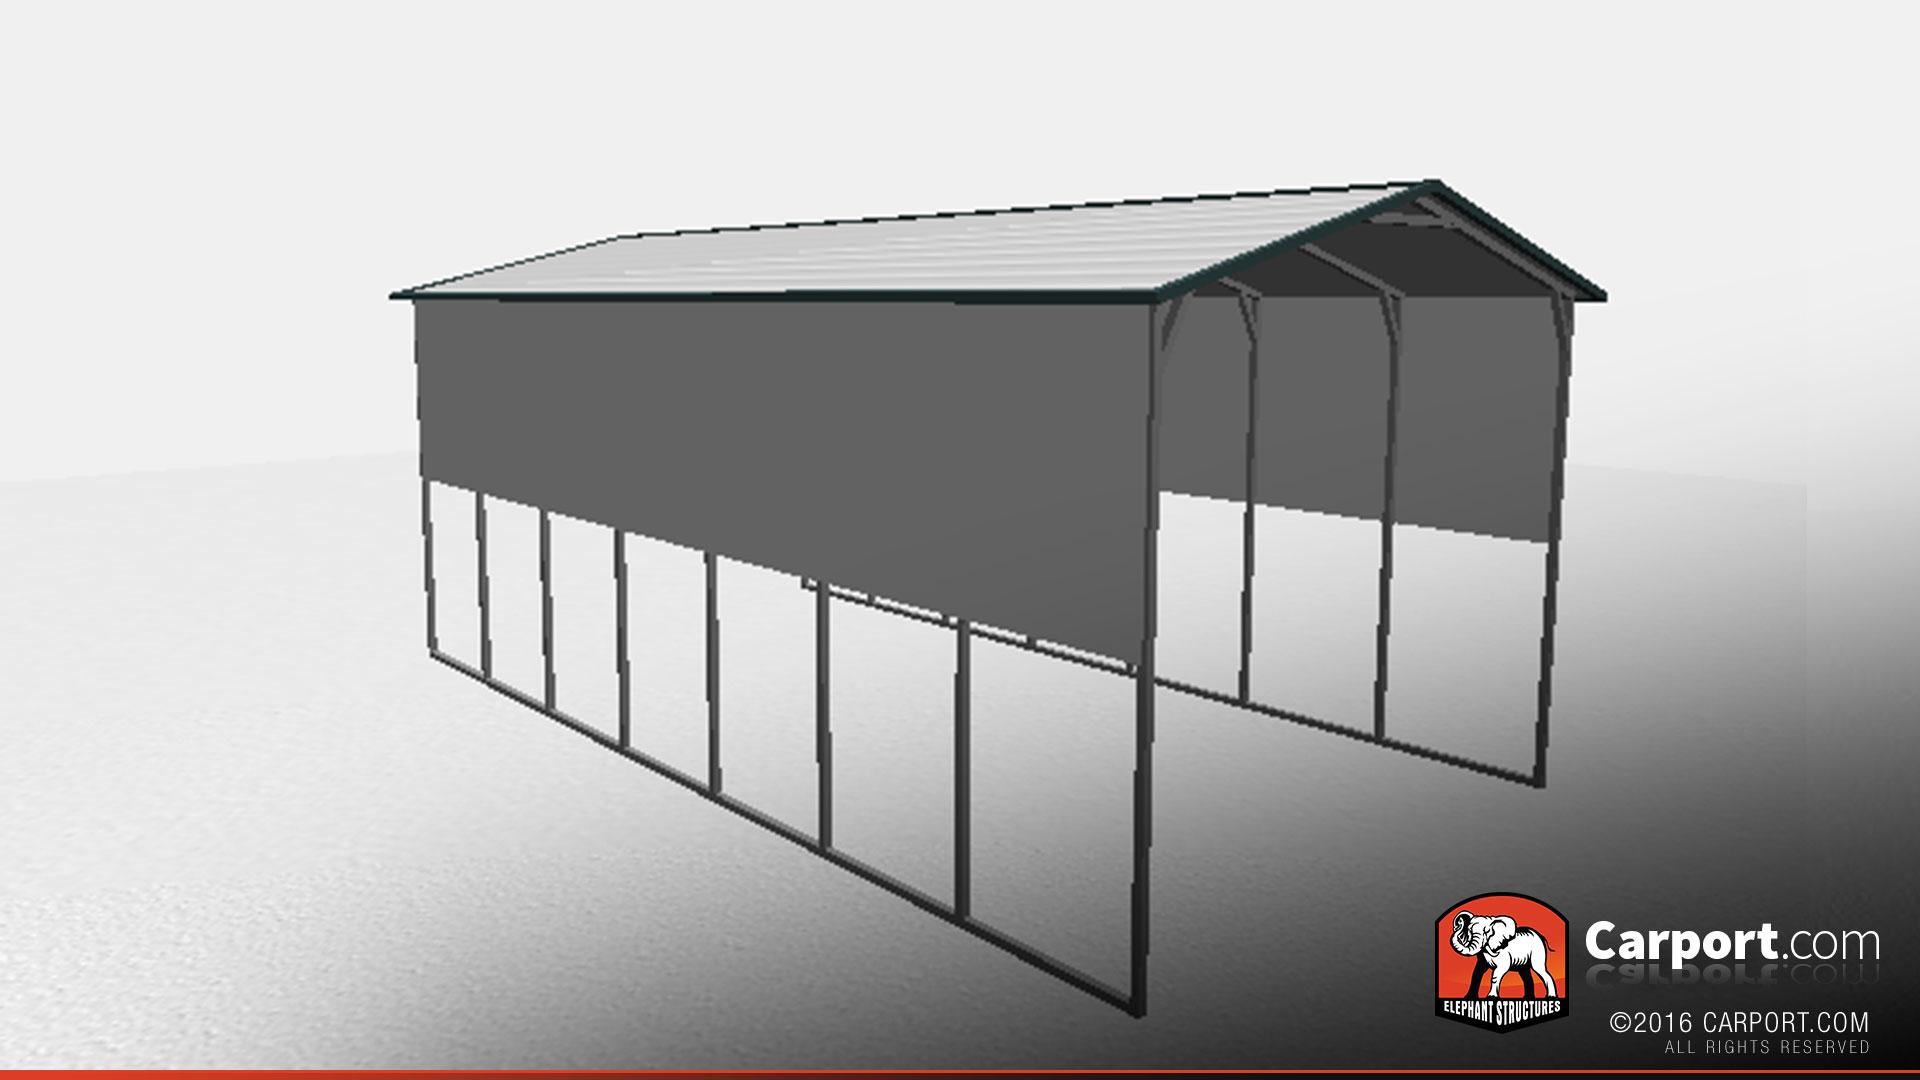 16 X 30 X 12 RV Carport With Extra Panels Shop Metal Buildings Online